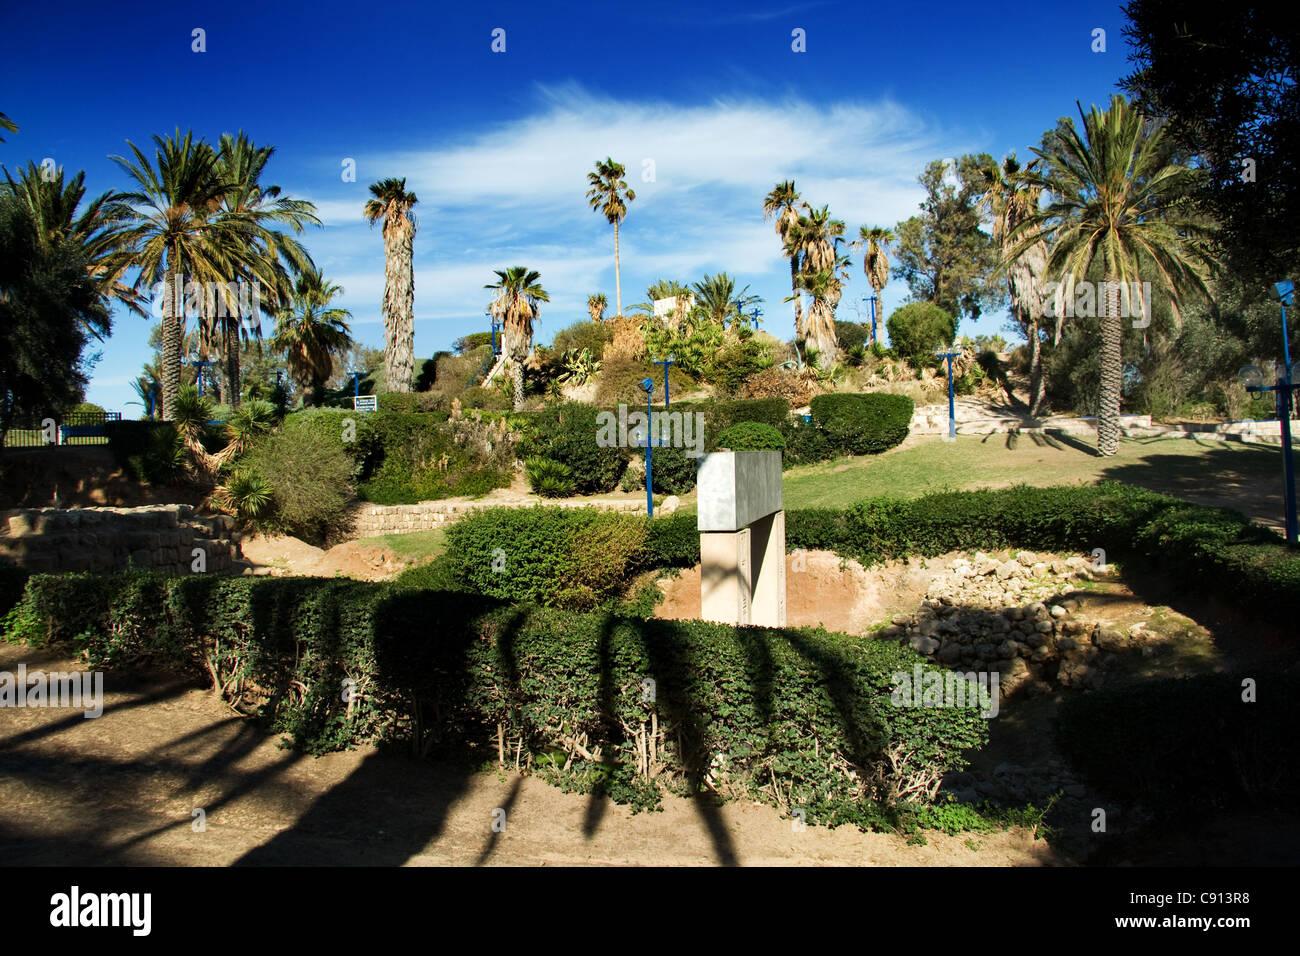 HaPisgah Gardens Park, Jaffa, Tel Aviv Israel - Stock Image